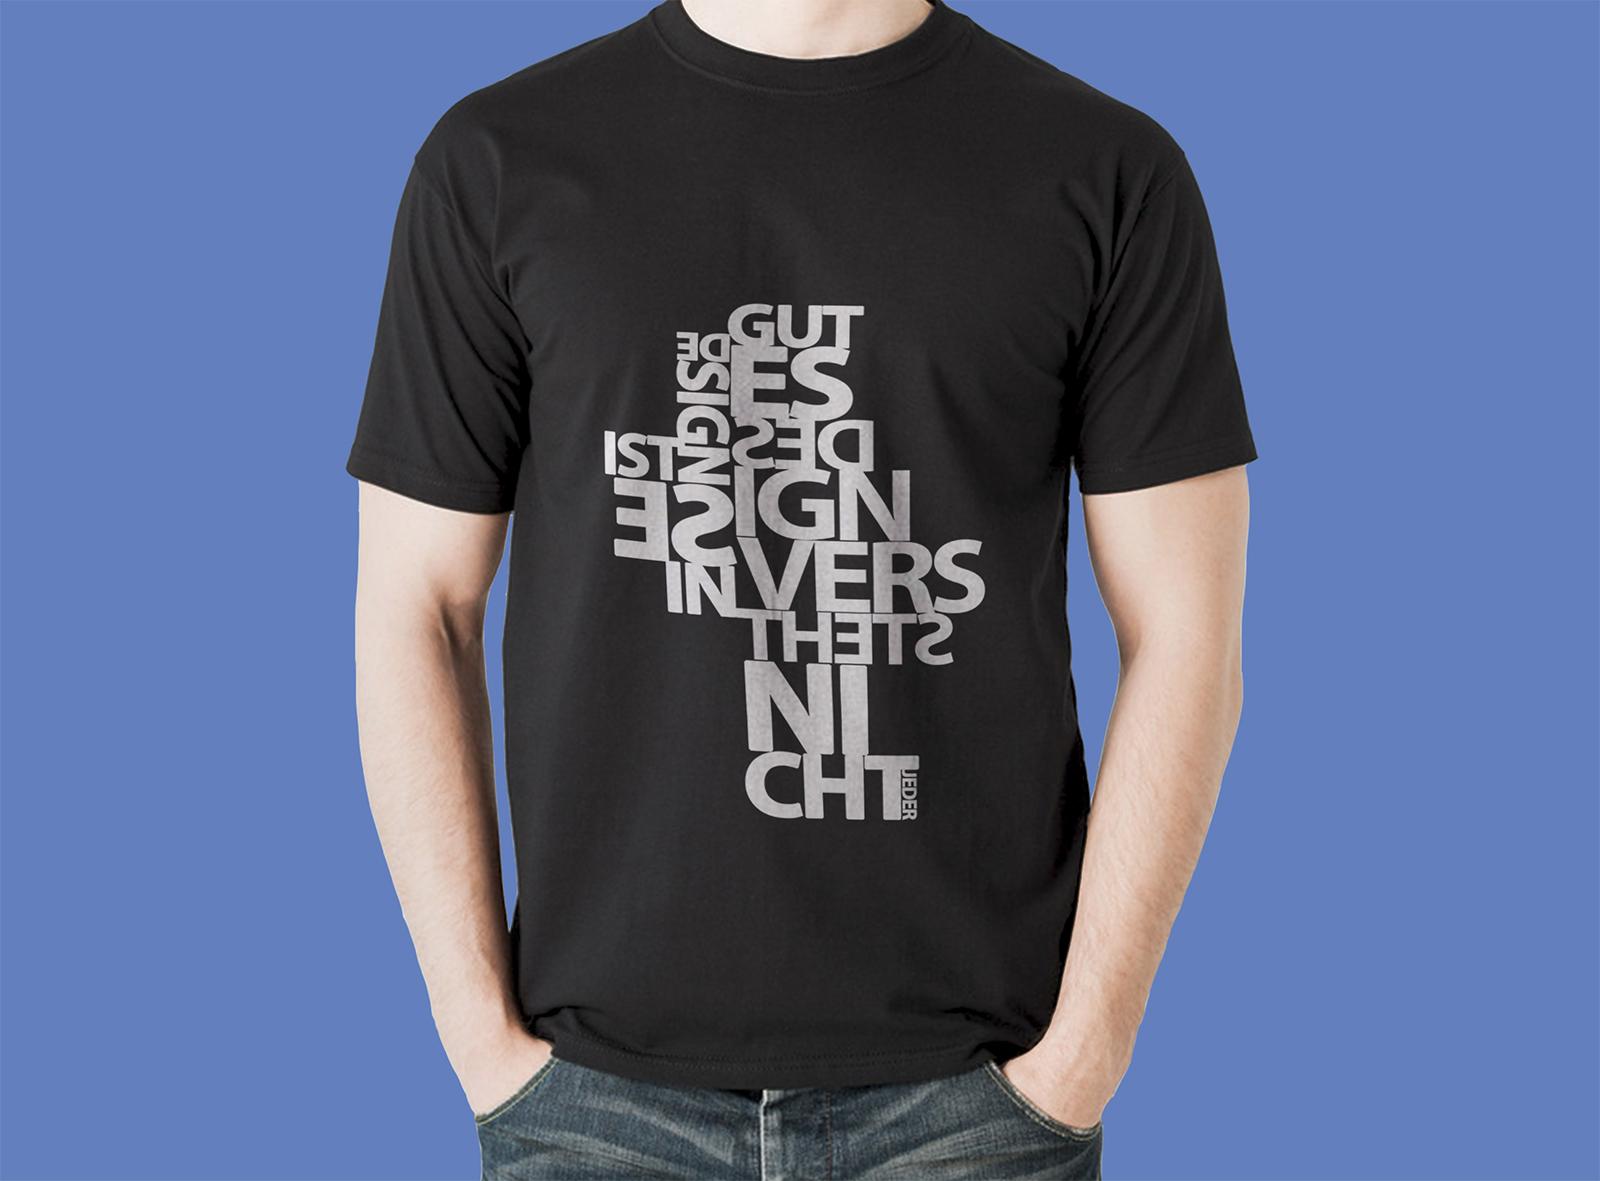 Free T-Shirt Design PSD Mockup